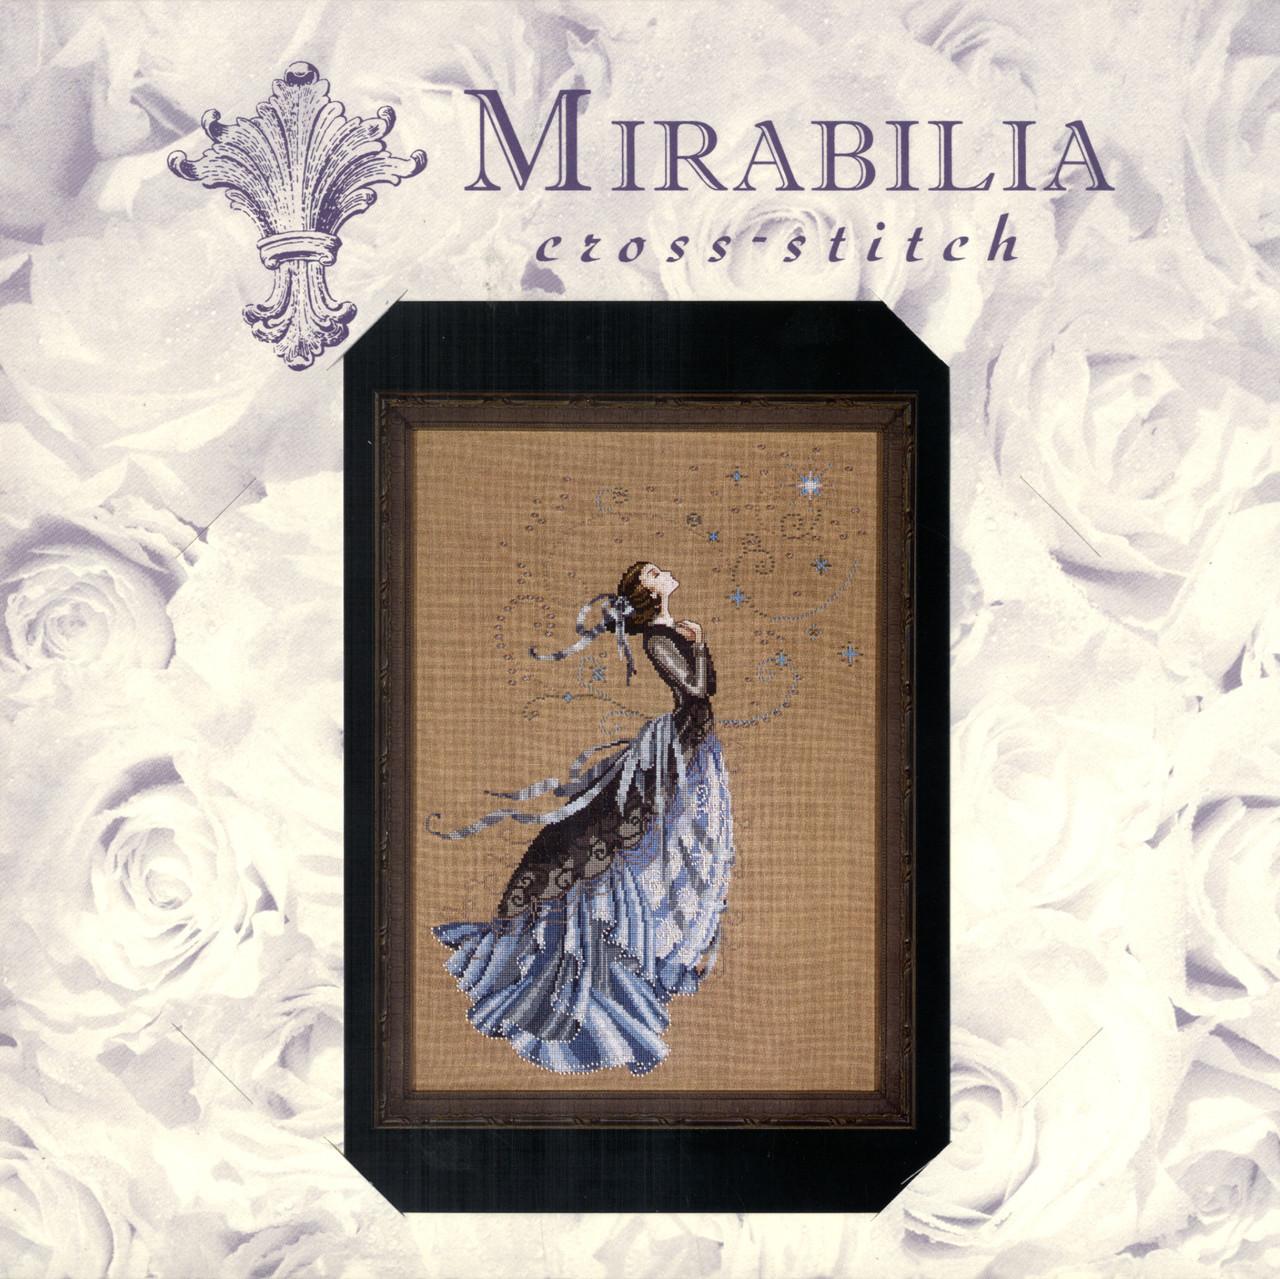 Mirabilia - The Stargazer